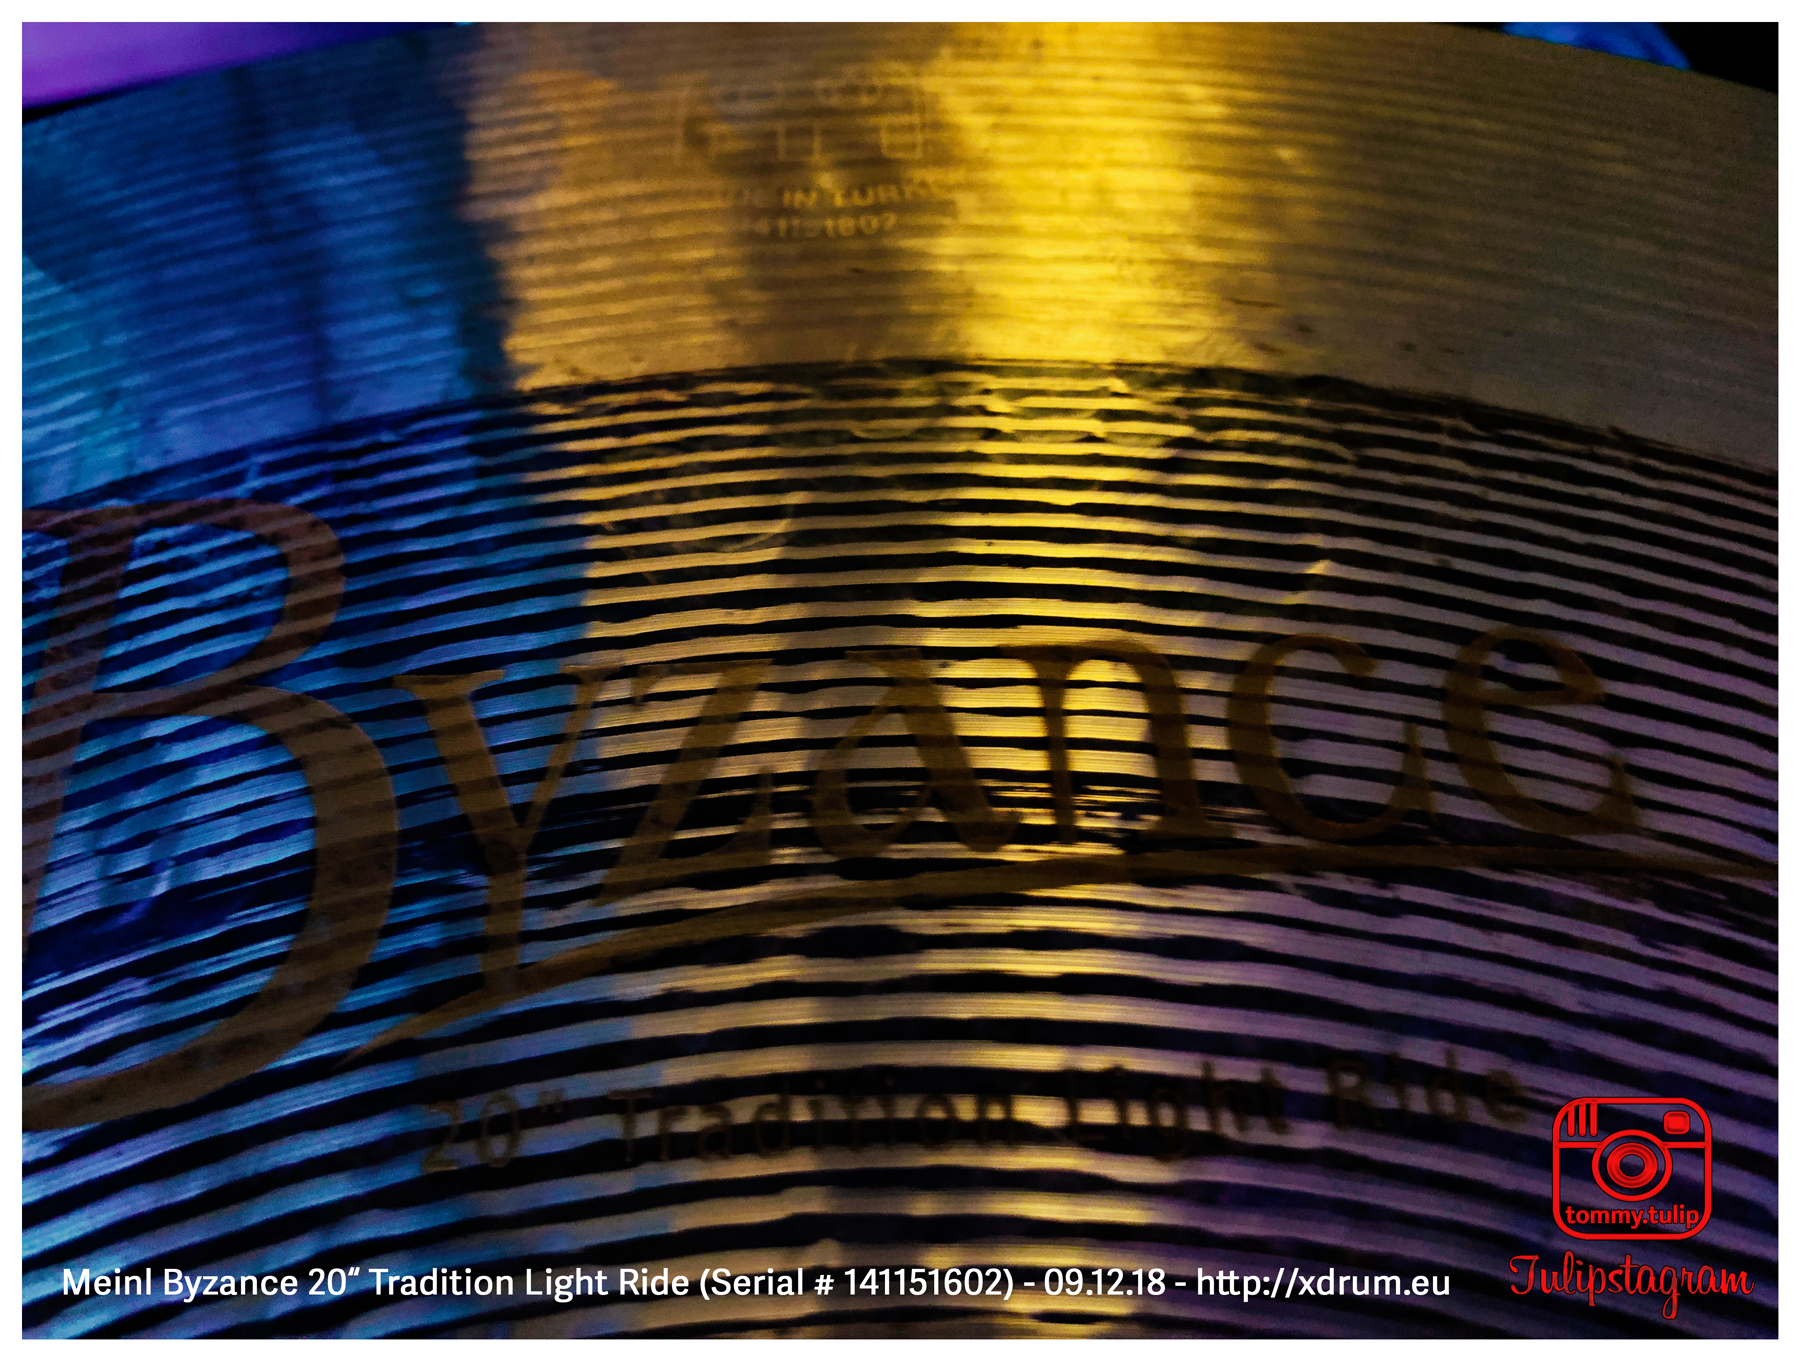 "Meinl Byzance 20"" Tradition Light Ride (Serial # 141151602) - 09.12.18 (© #TTT)"